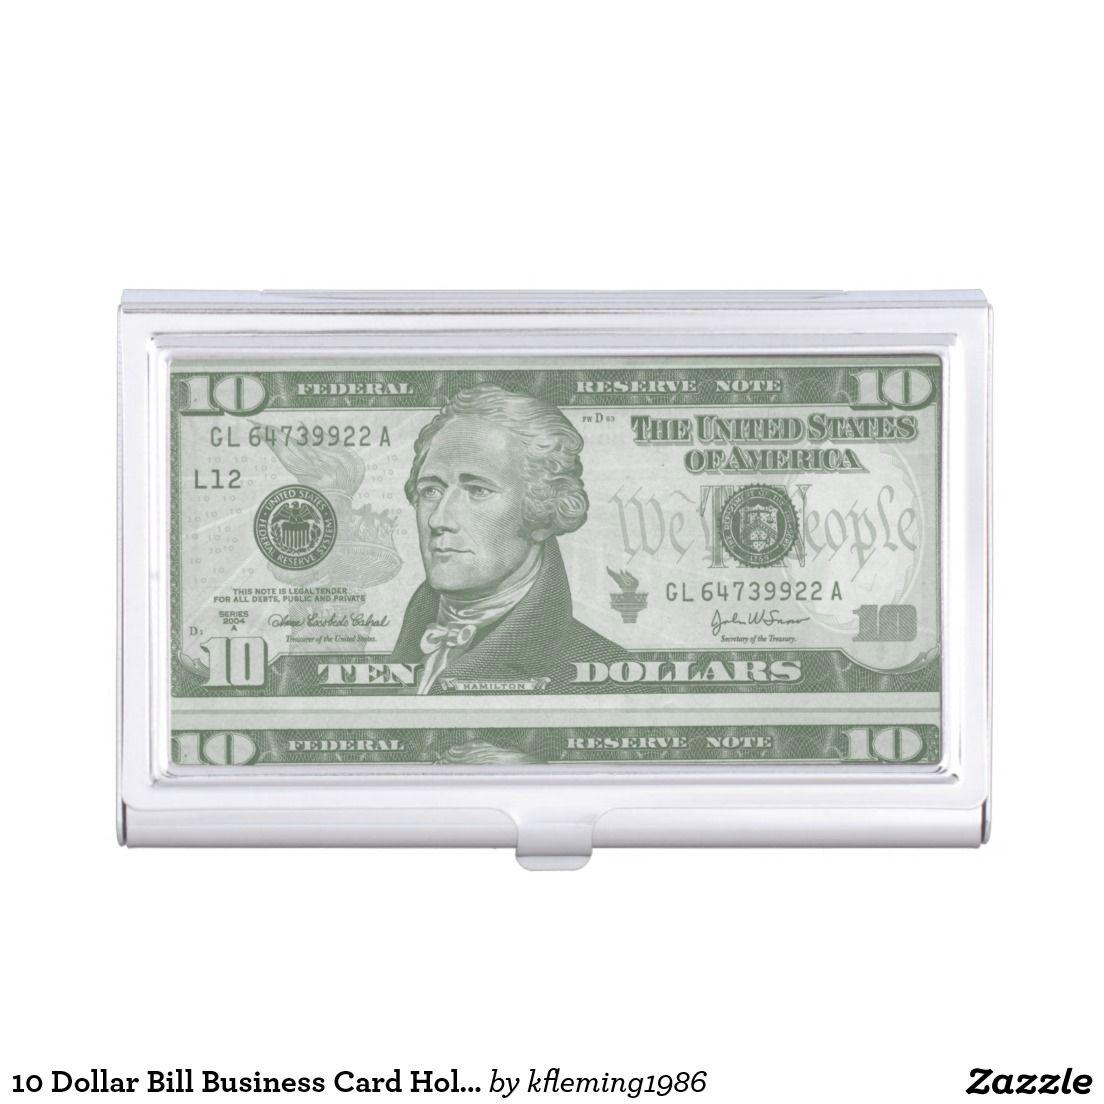 10 Dollar Bill Business Card Holder | Business card holders ...